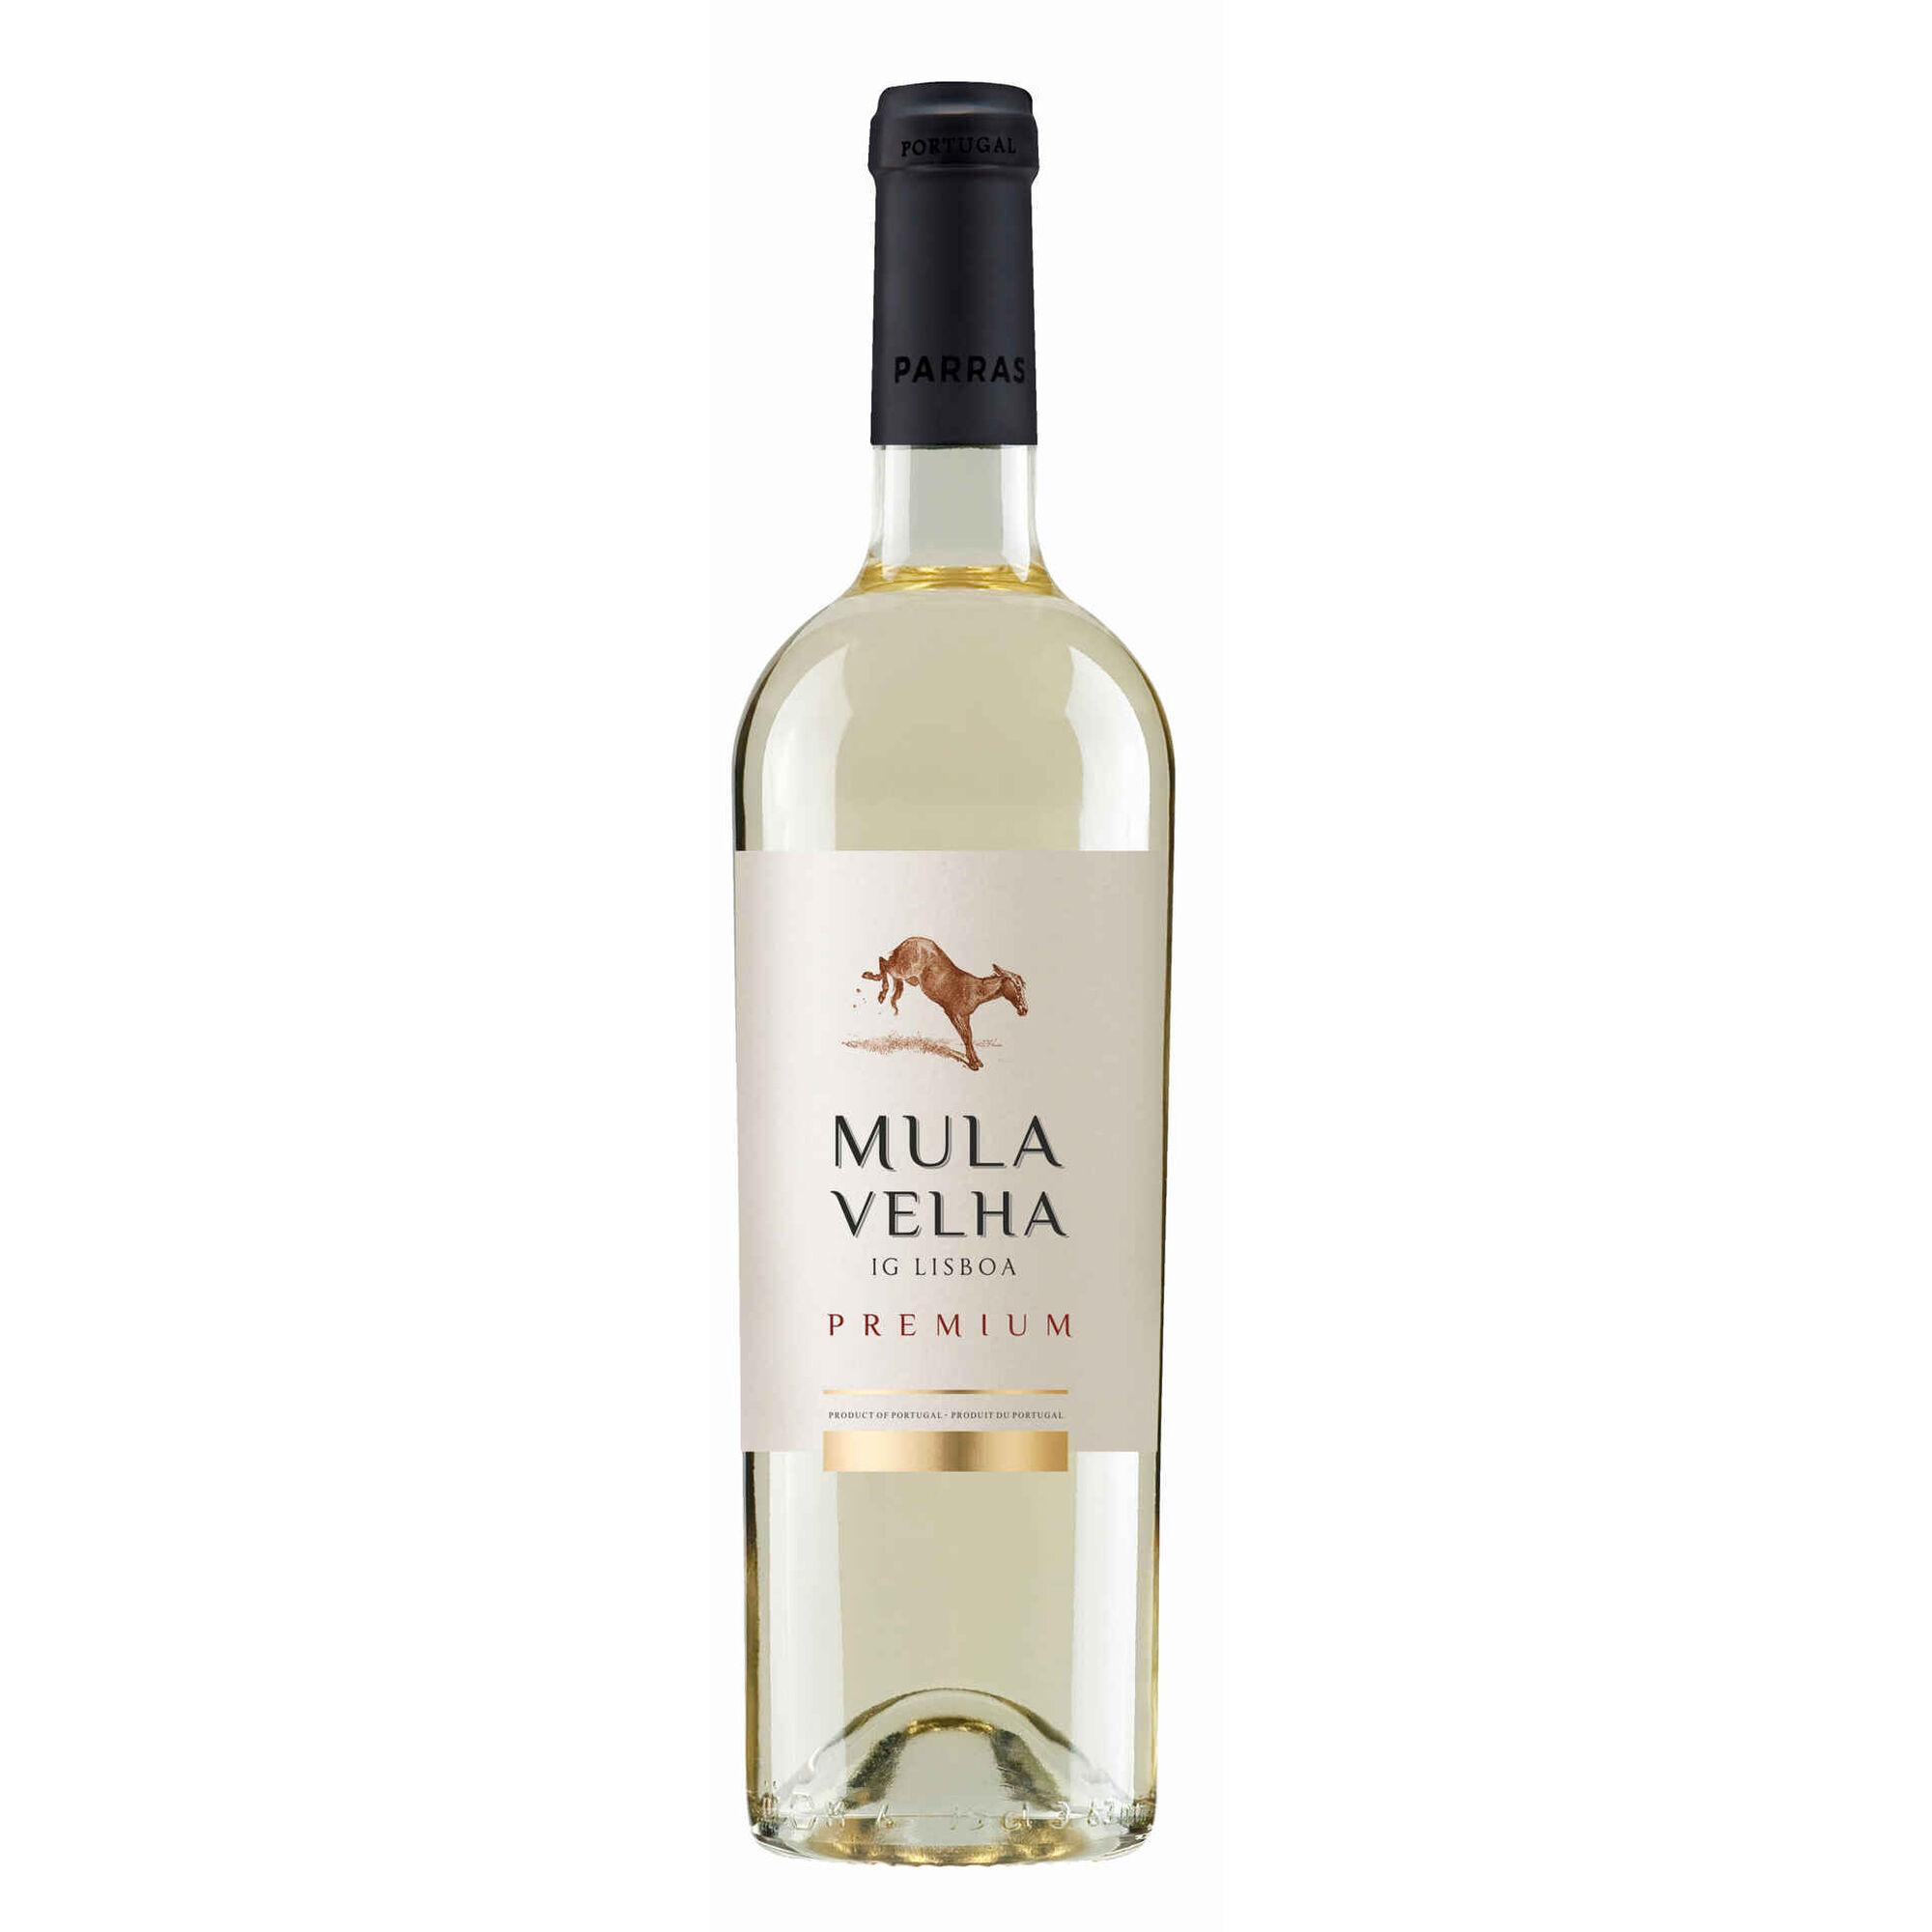 Mula Velha Premium Regional Lisboa Vinho Branco